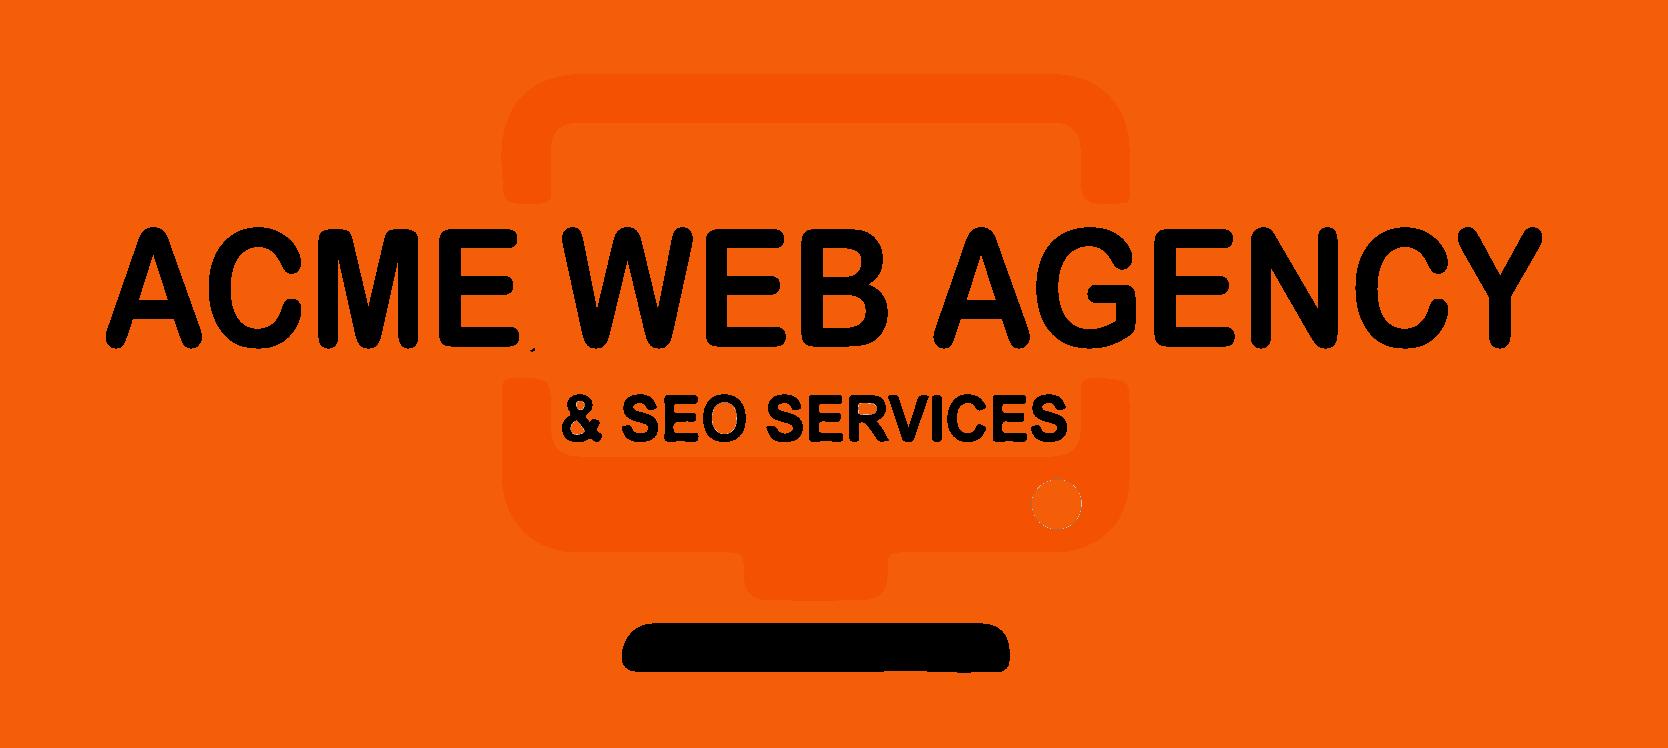 Liverpool SEO Company, Liverpool Ad Agency, Acme web agency